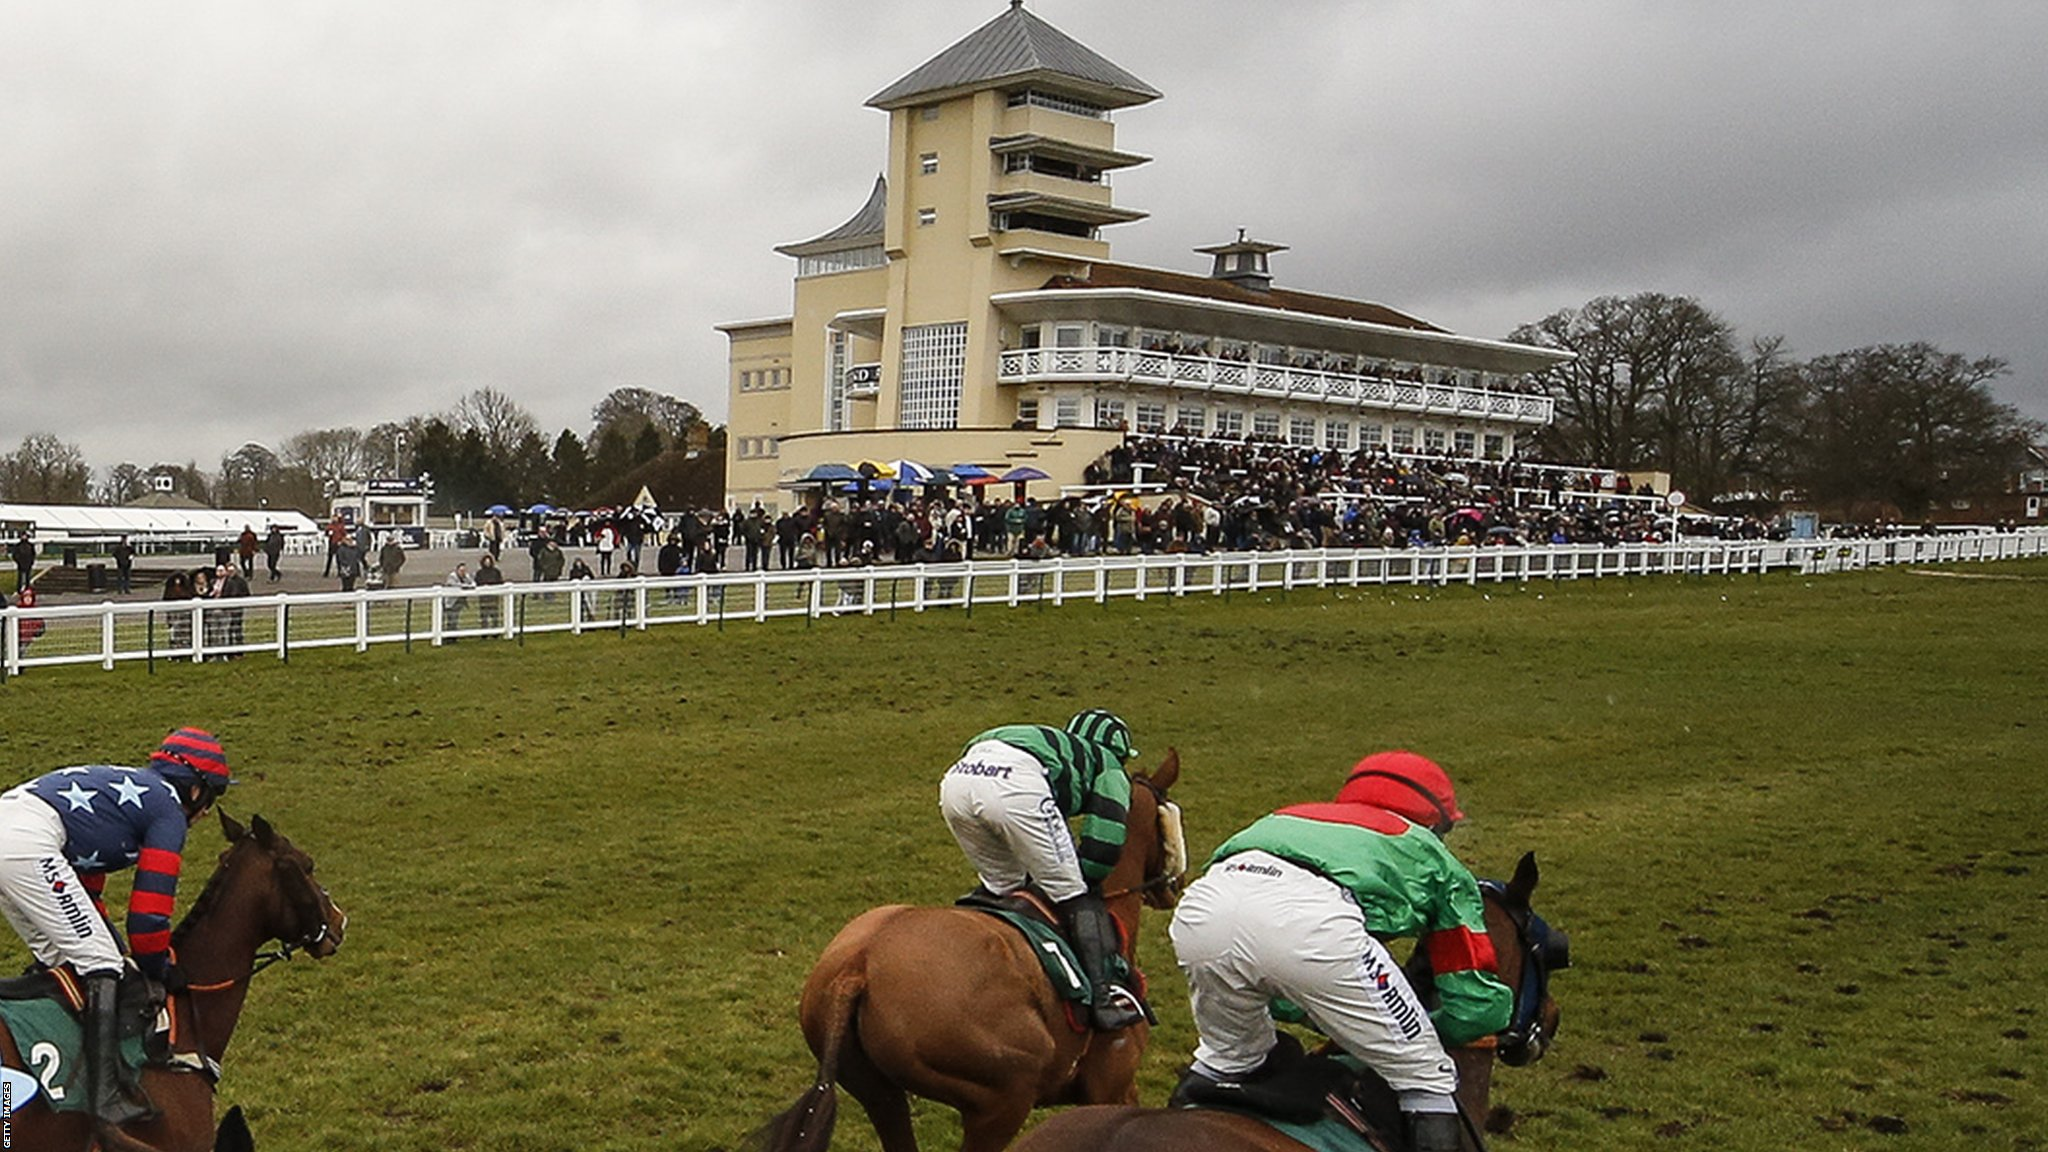 Towcester racecourse: Administrators looking for October sale